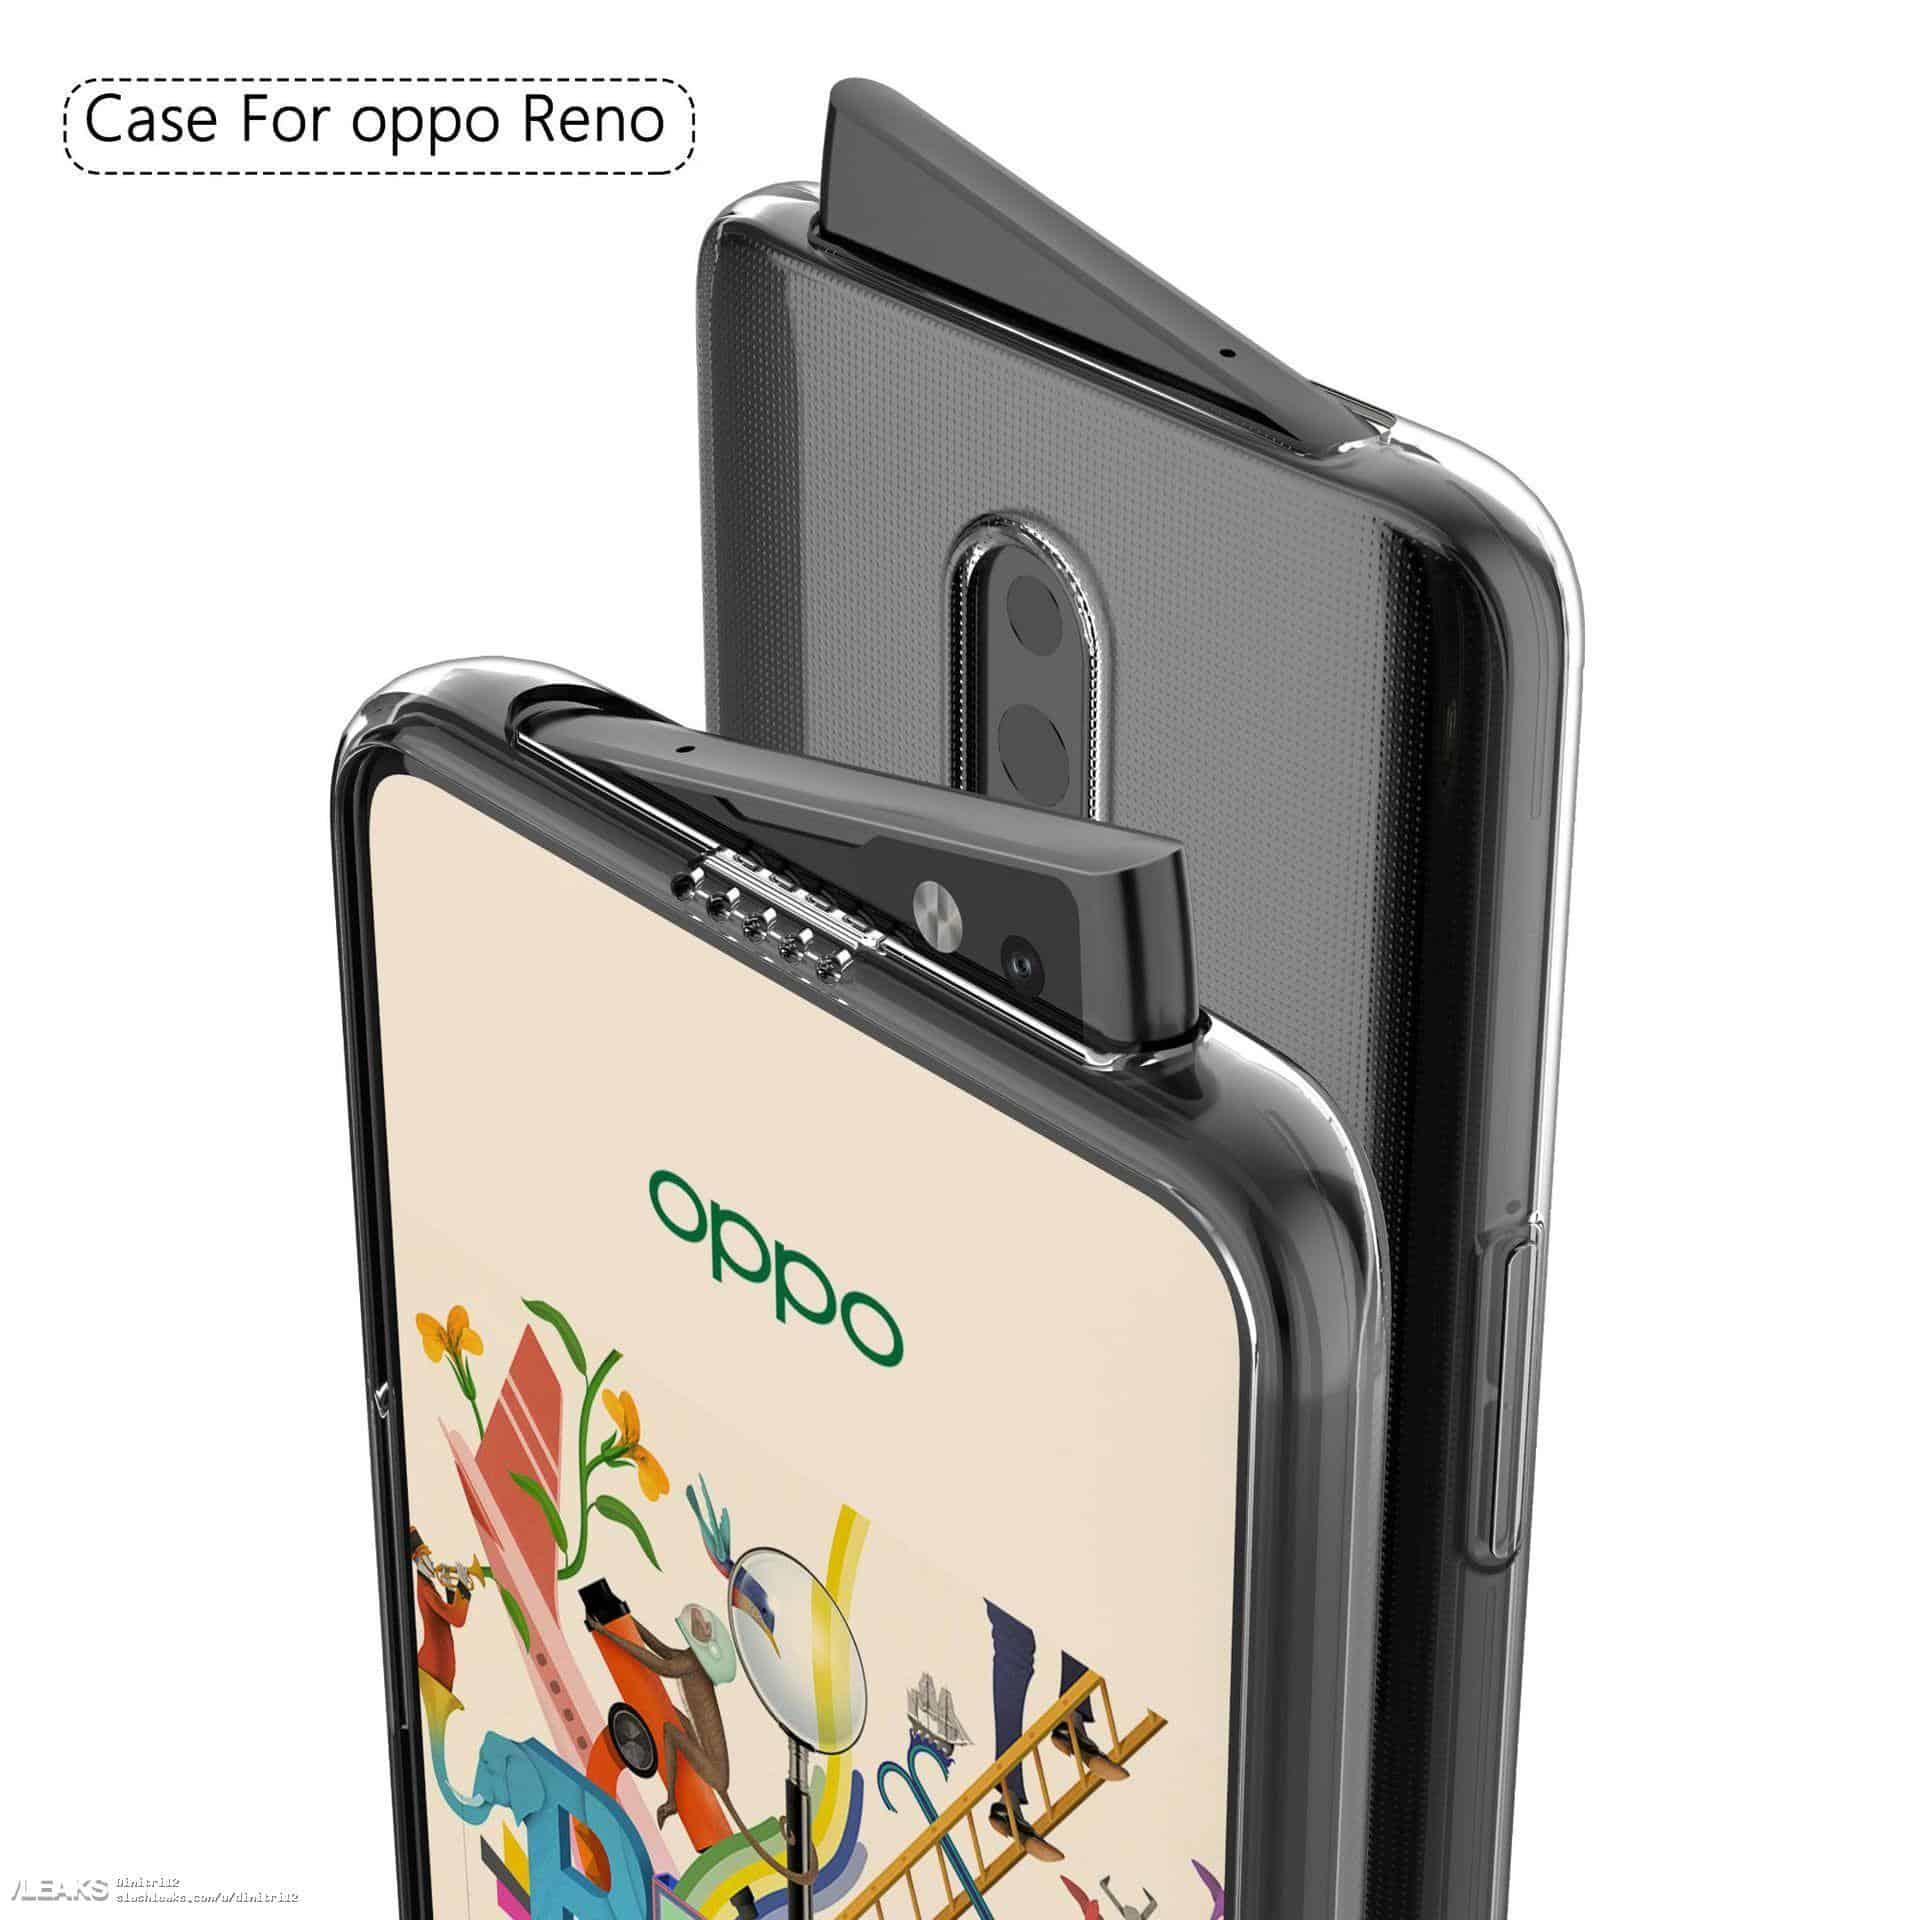 OPPO-Reno-case-renders-b